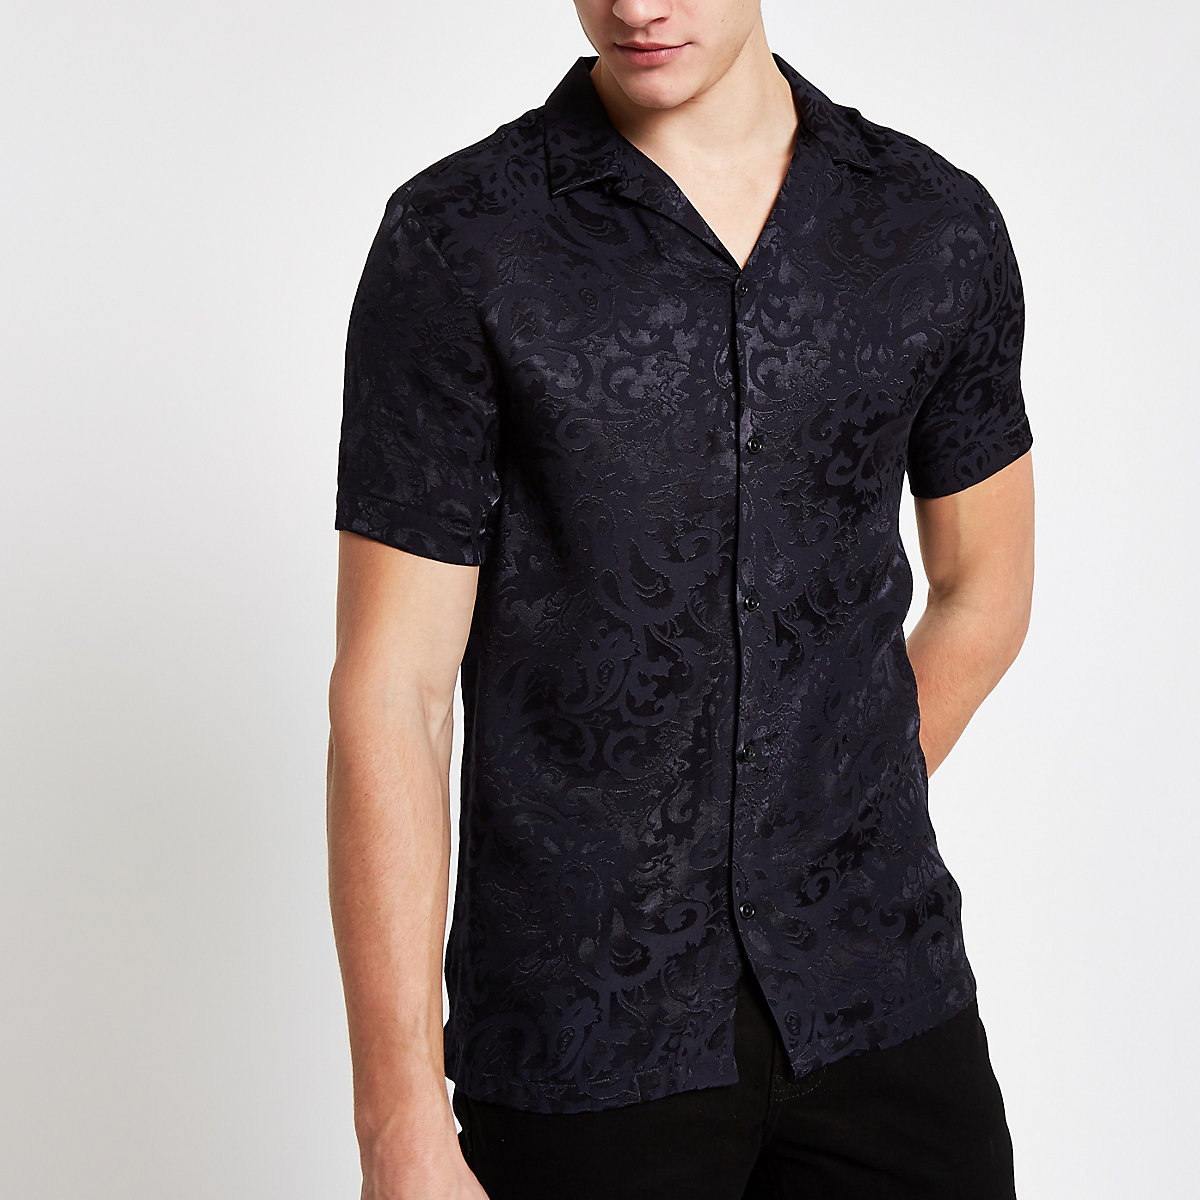 Navy jacquard revere shirt